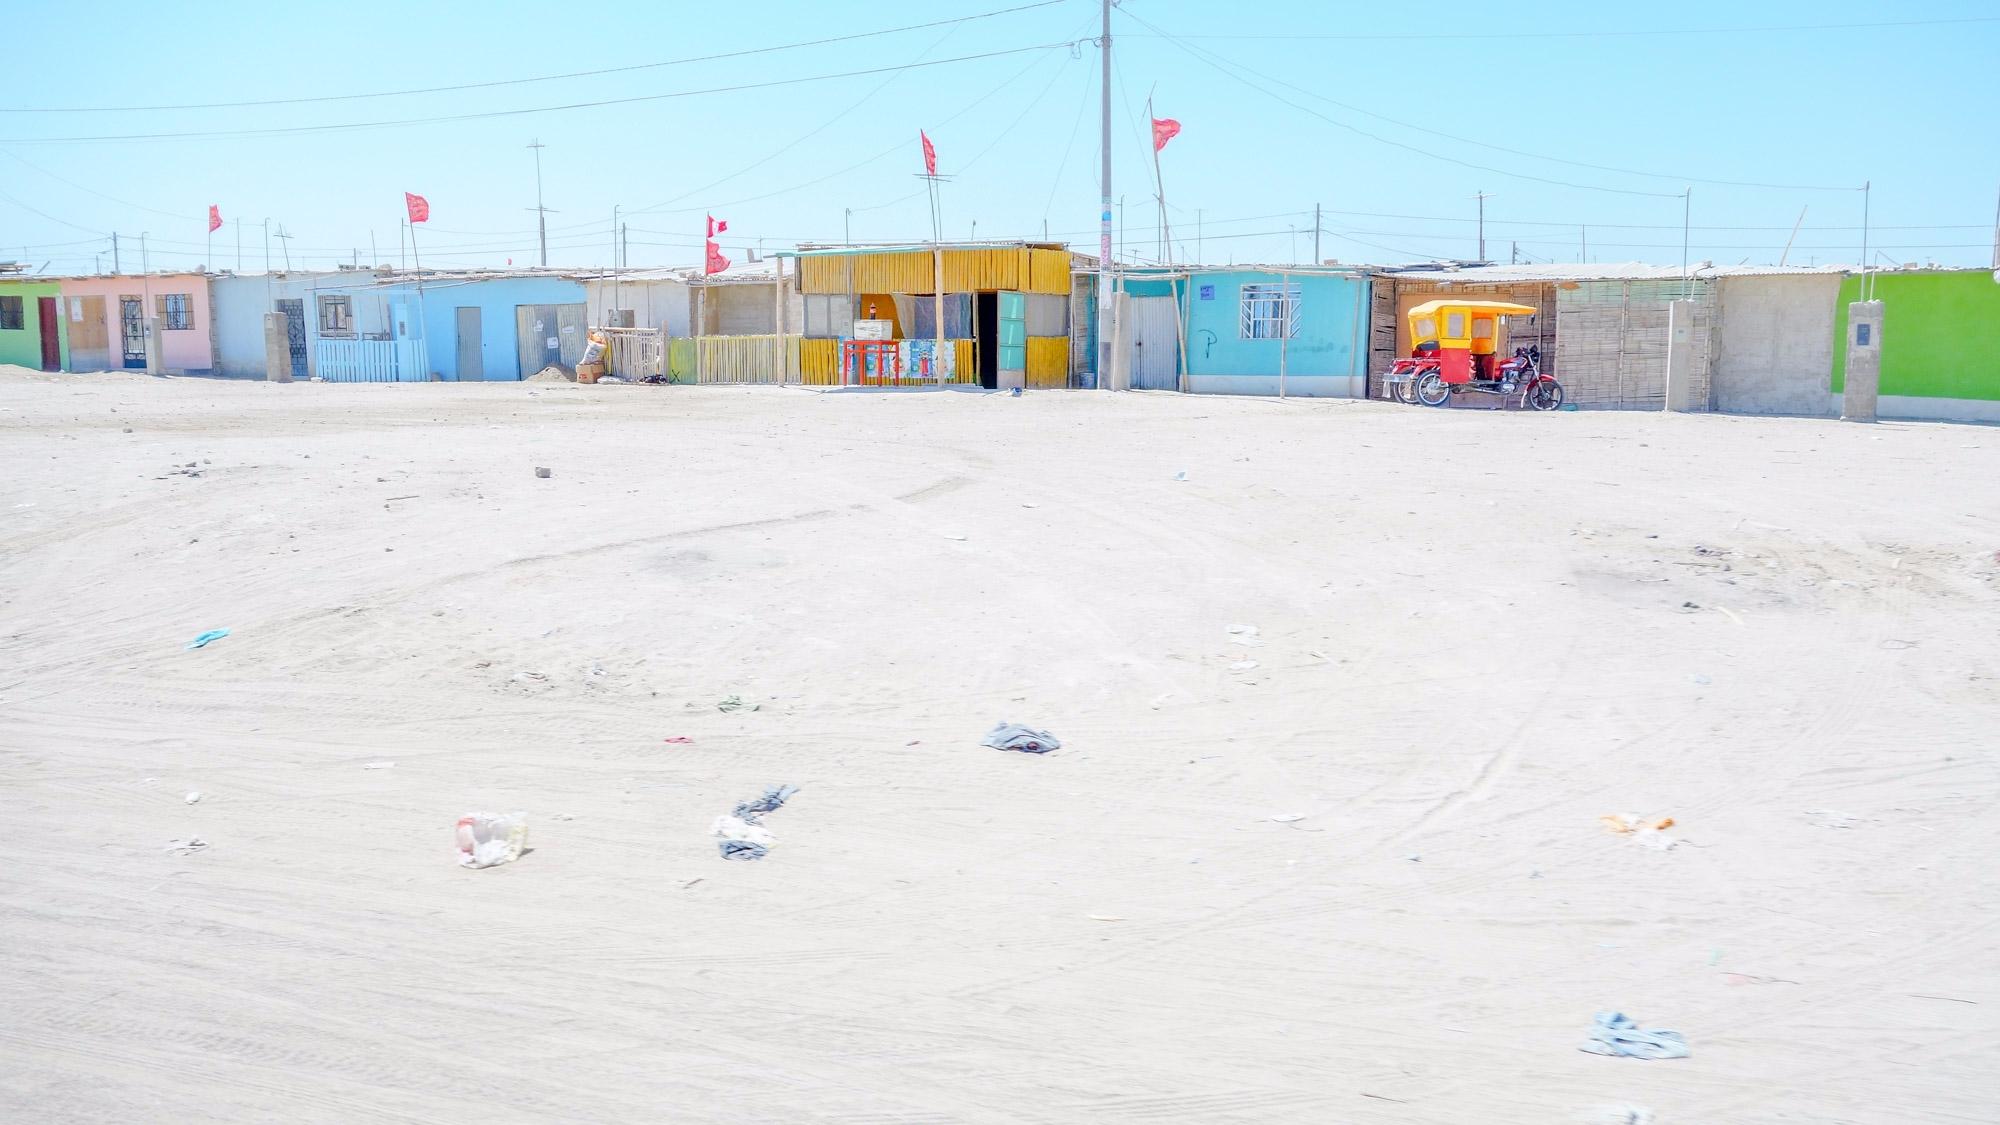 Paita, Peru sky - clear, color, - chrishuddleston   ello